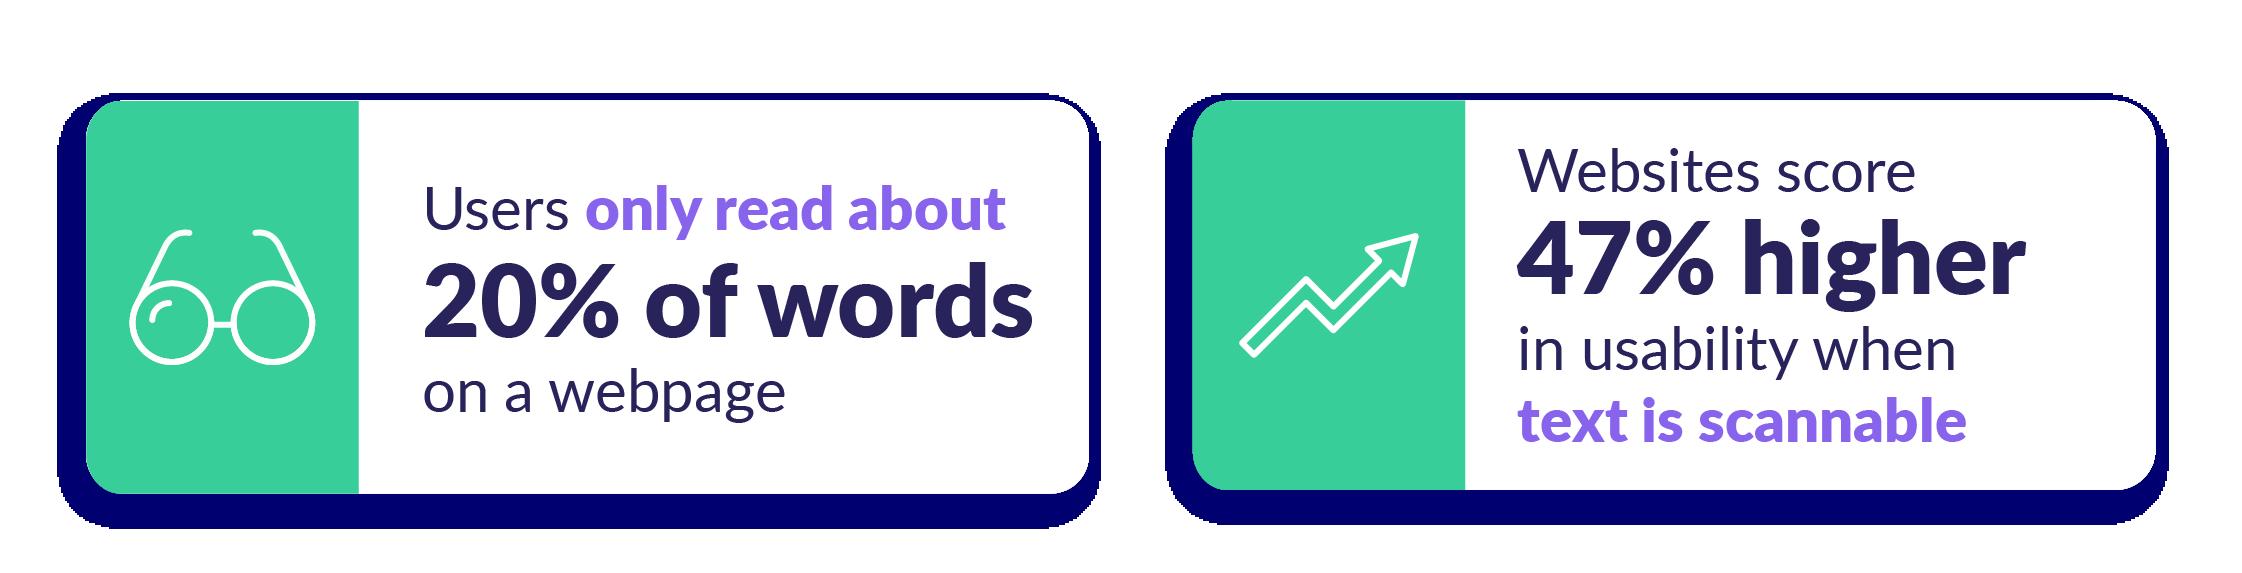 bold fonts web trend statistics